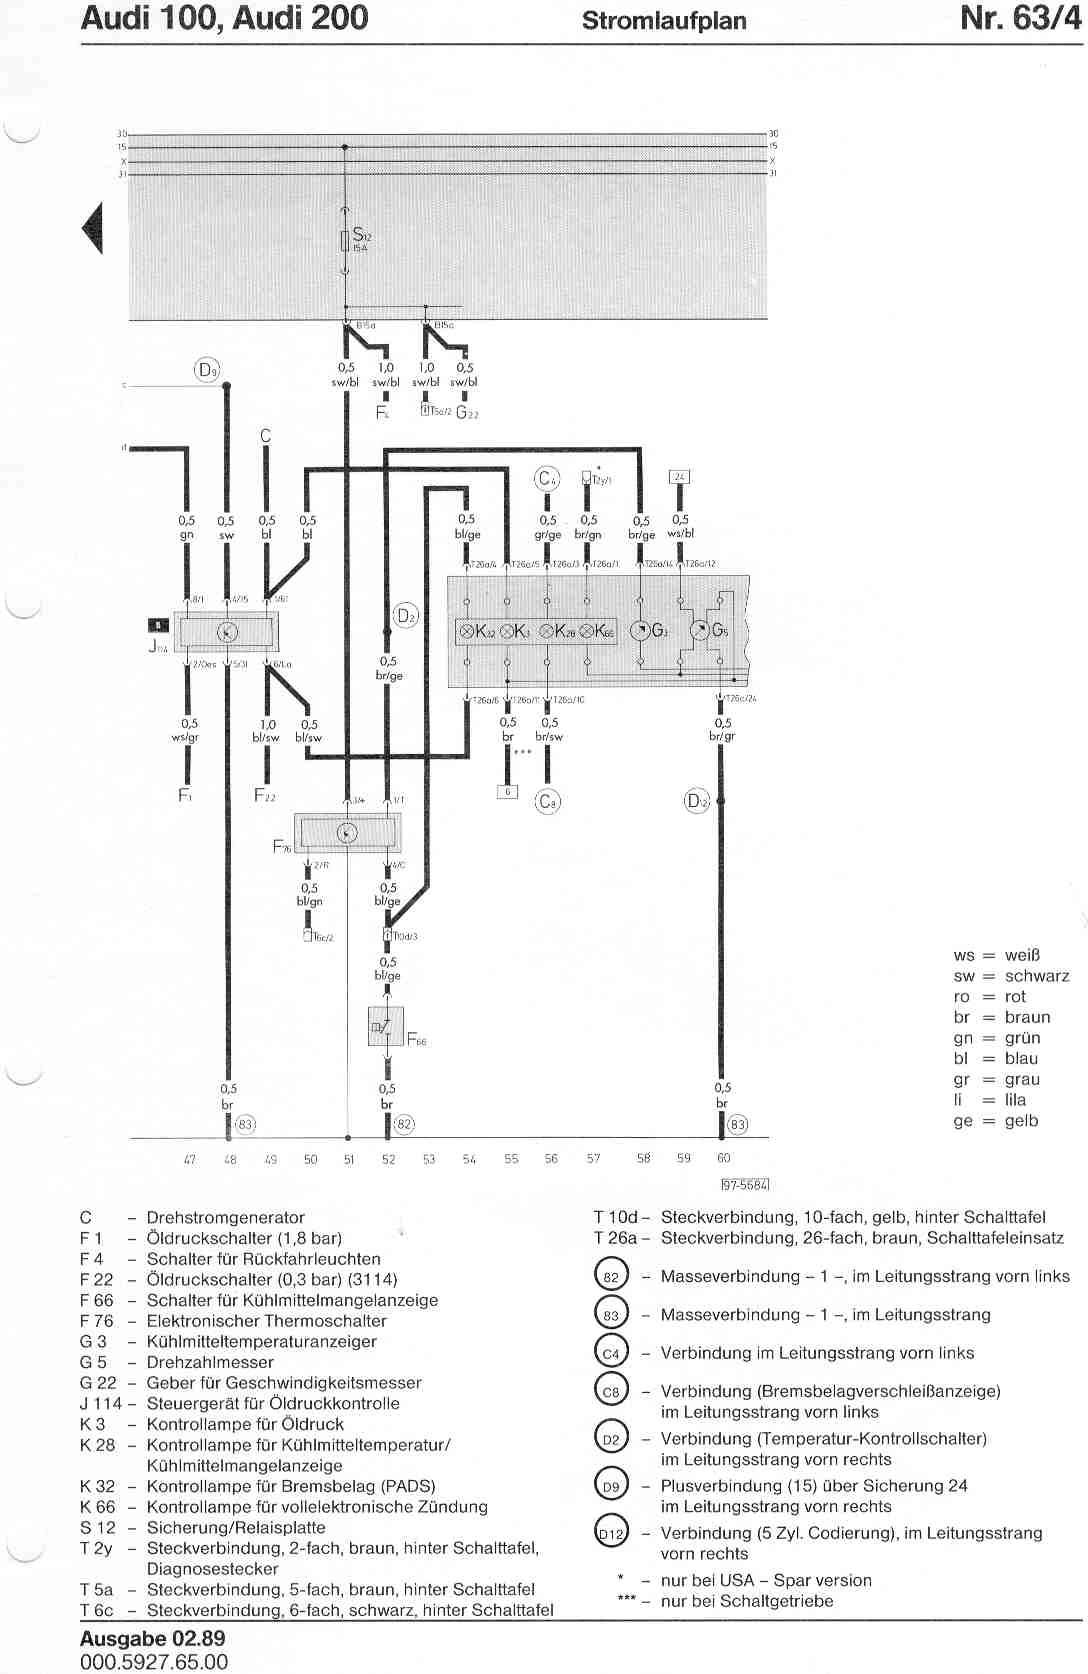 audi 100 c4 wiring diagram shark internal organs 200 factory diagrams